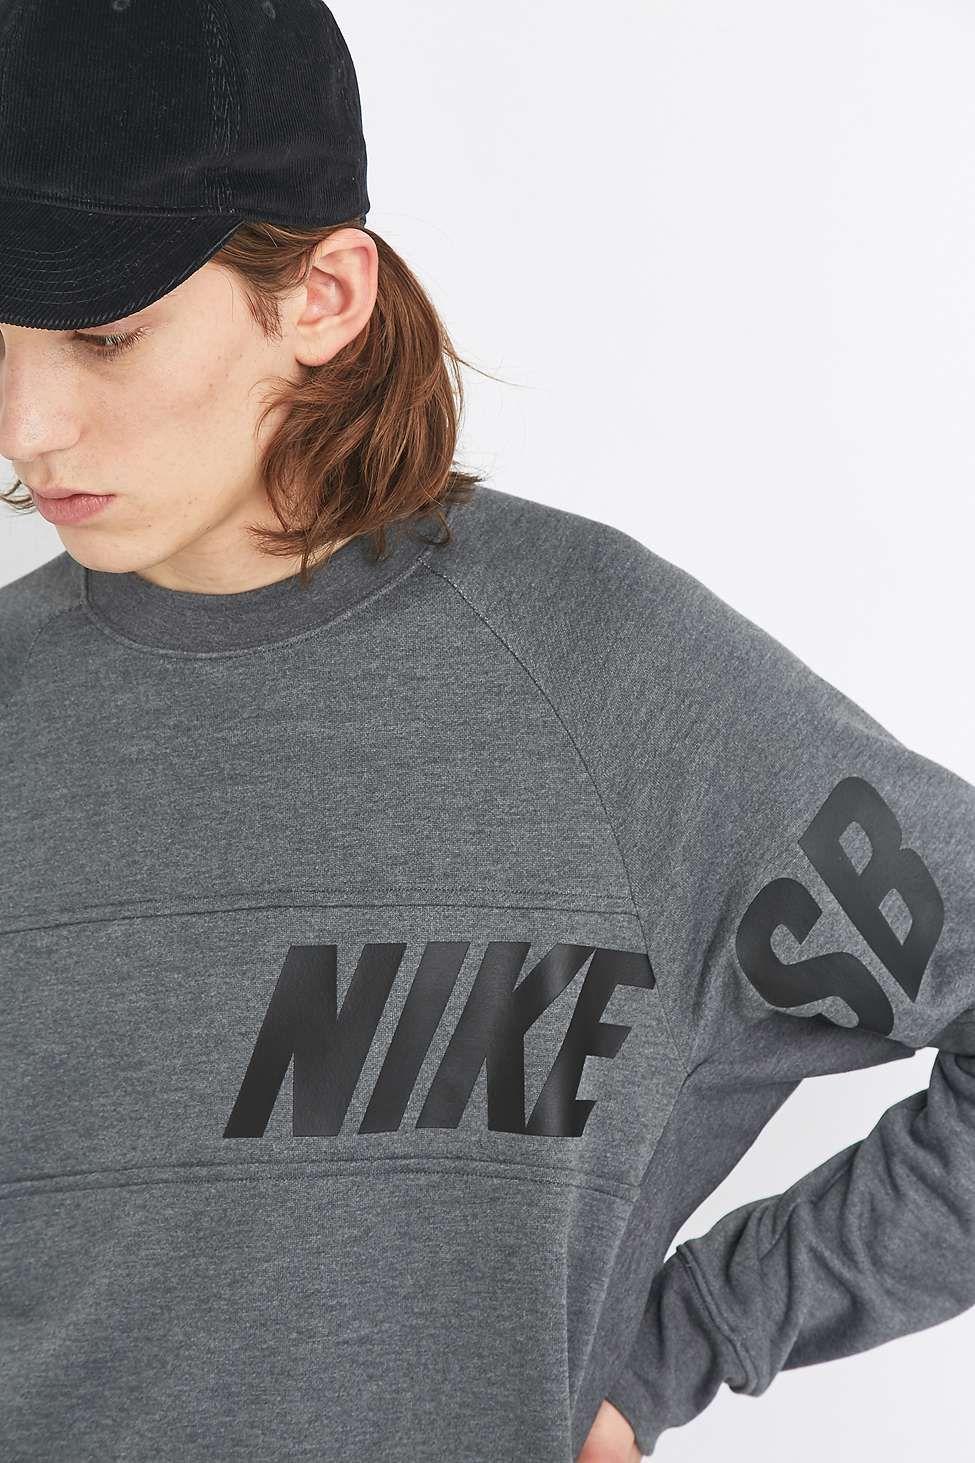 Nike Sweat Ras Du Cou Sb Everett Gris Grey Crewneck Crew Neck Sweatshirt Nike Sweats [ 1463 x 975 Pixel ]